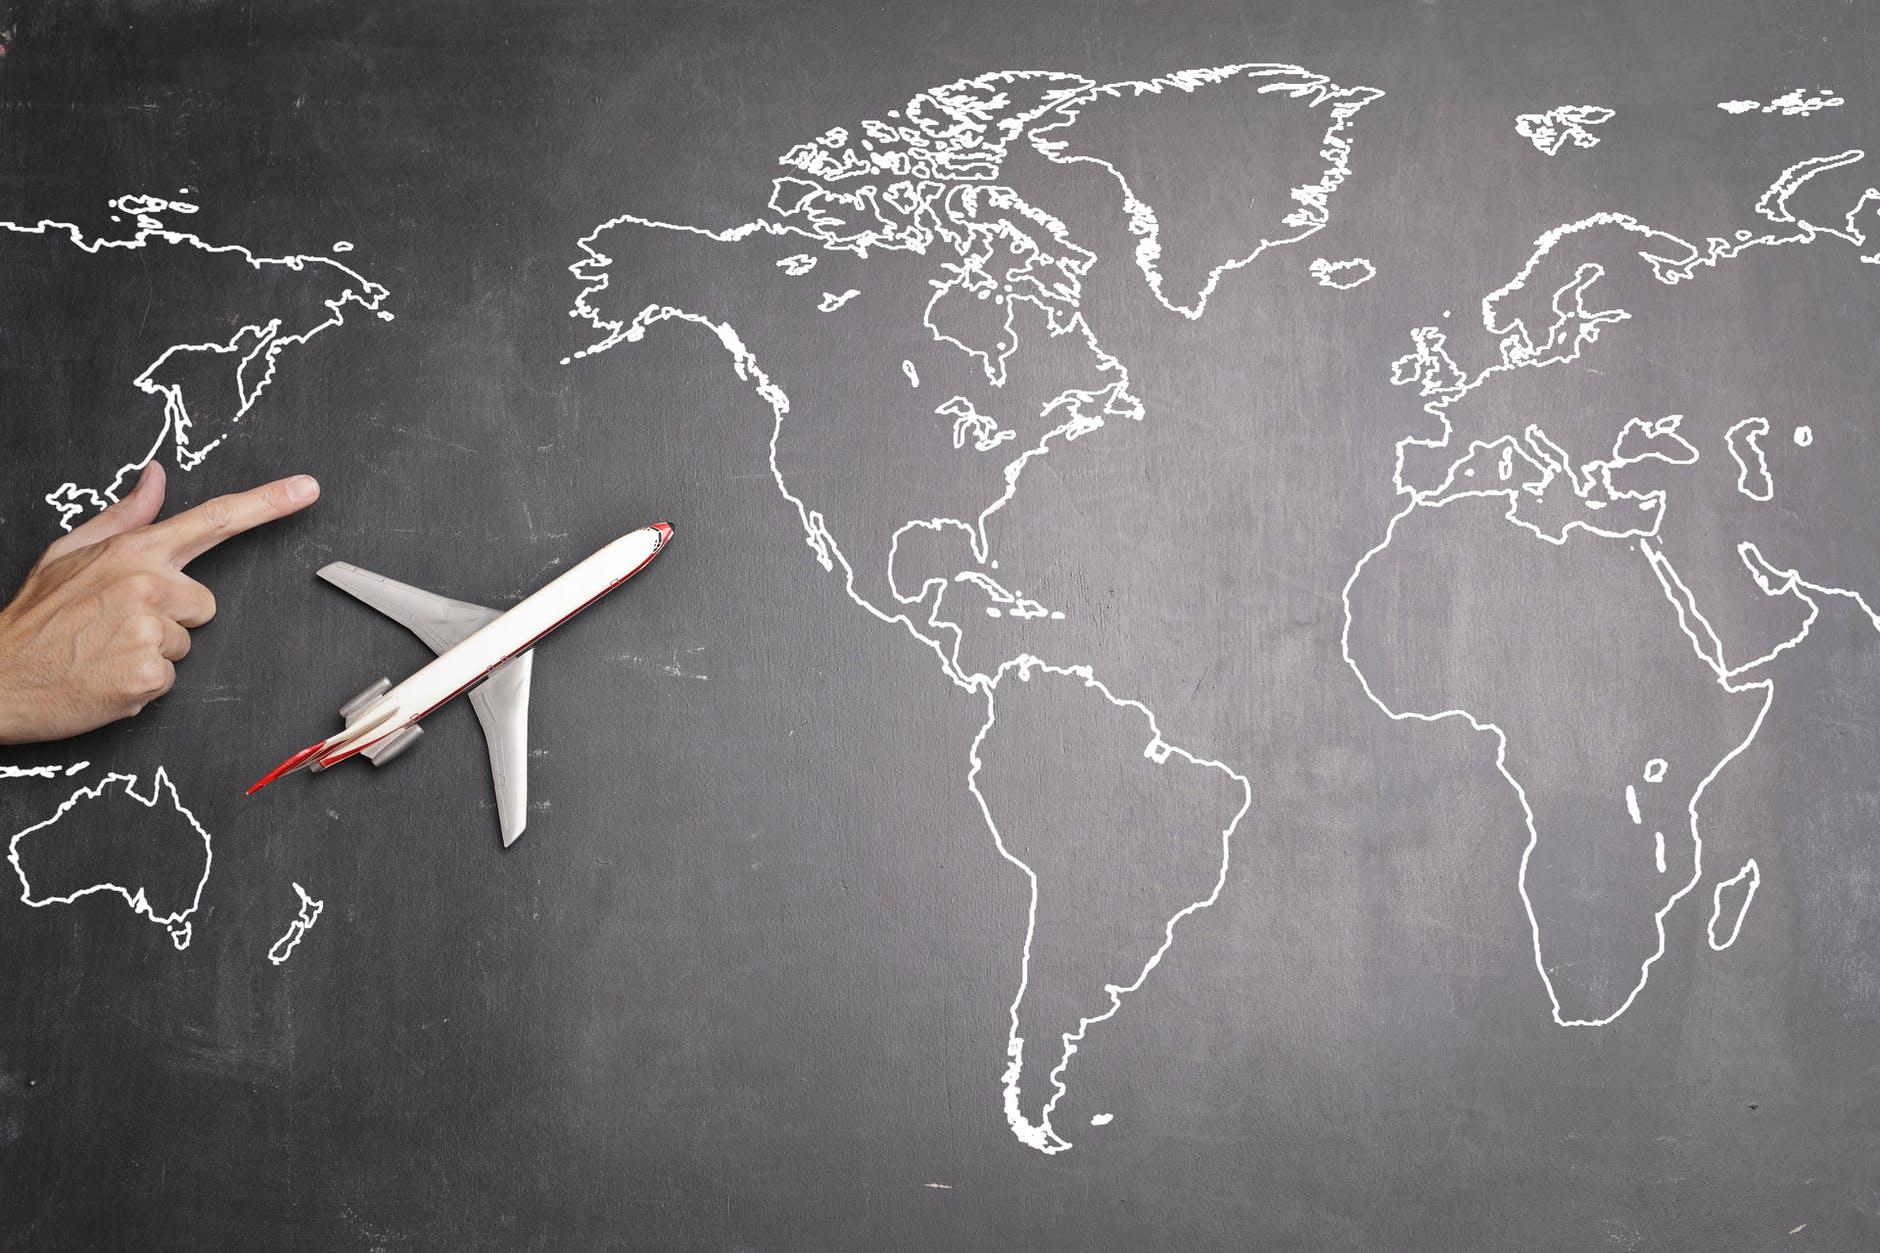 airplane over world map on blackboard